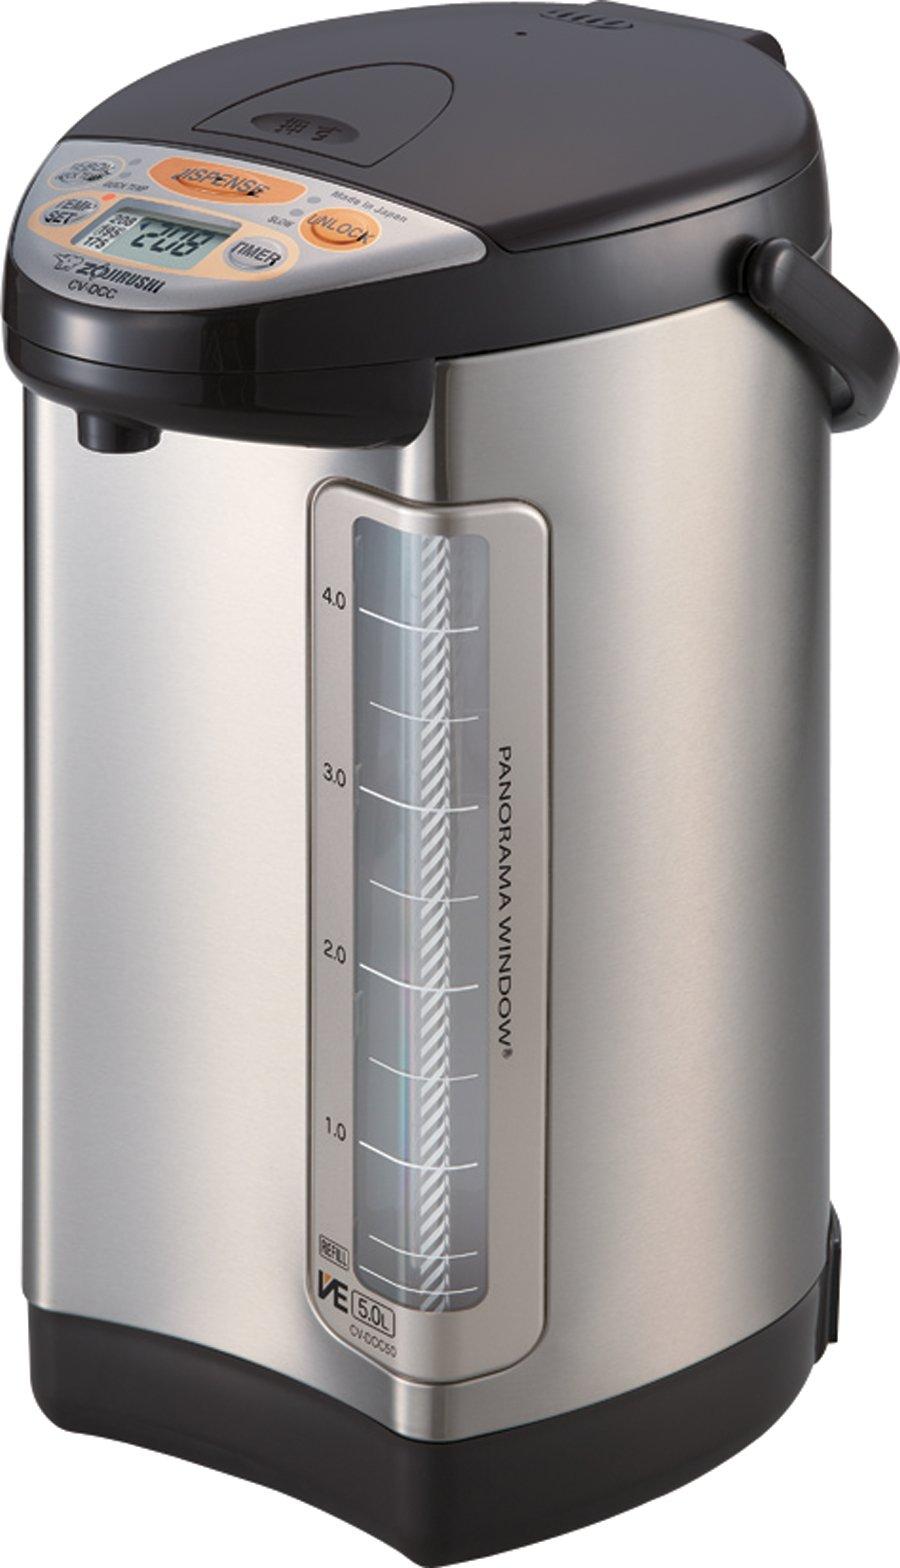 Zojirushi America Corporation CV-DCC50XT VE Hybrid Water Boiler and Warmer, 5-Liter, Stainless Dark Brown by Zojirushi